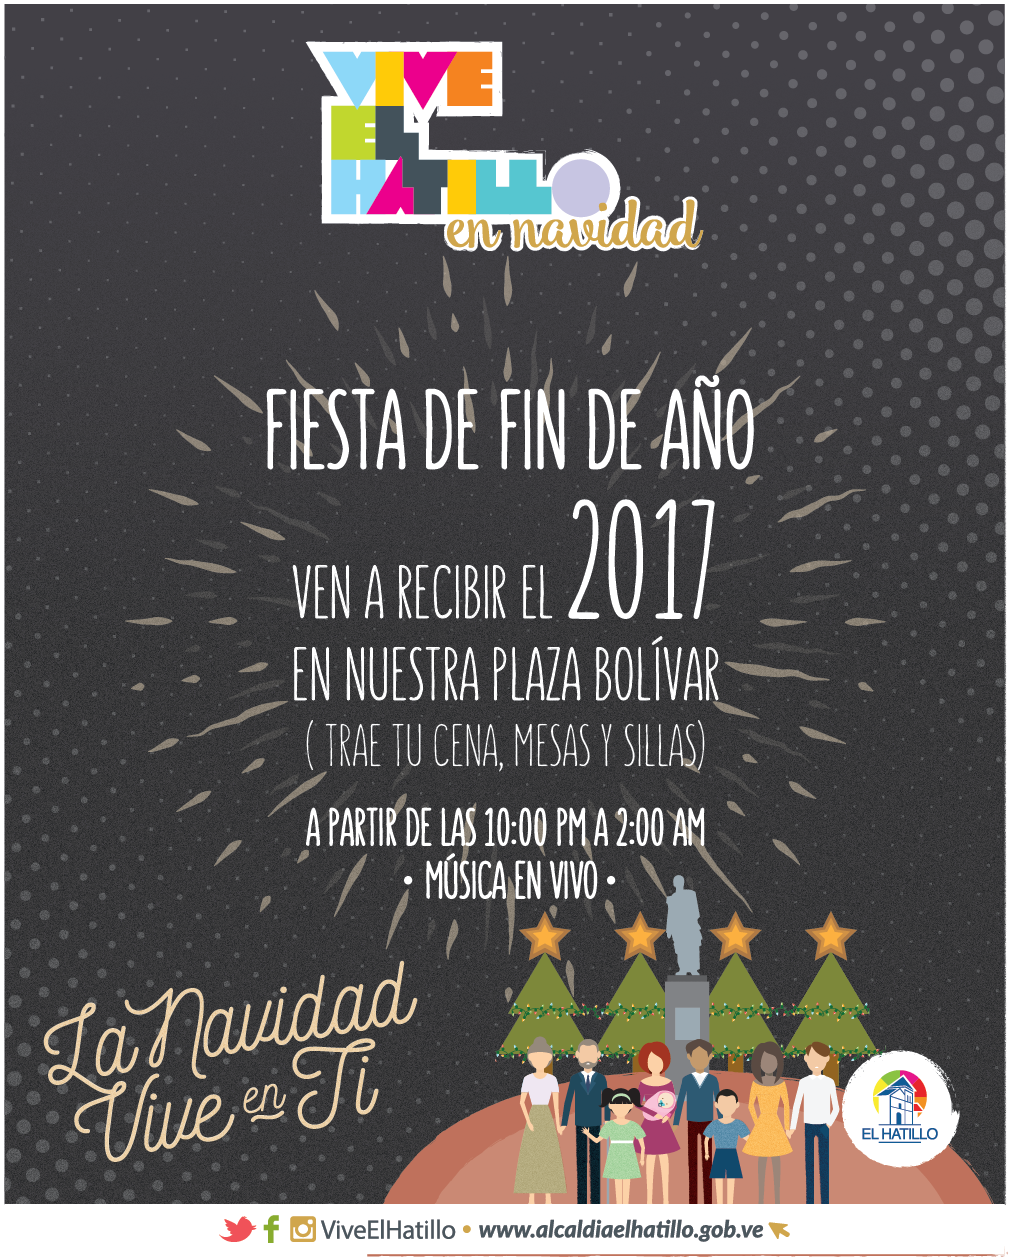 Fiesta312016-01